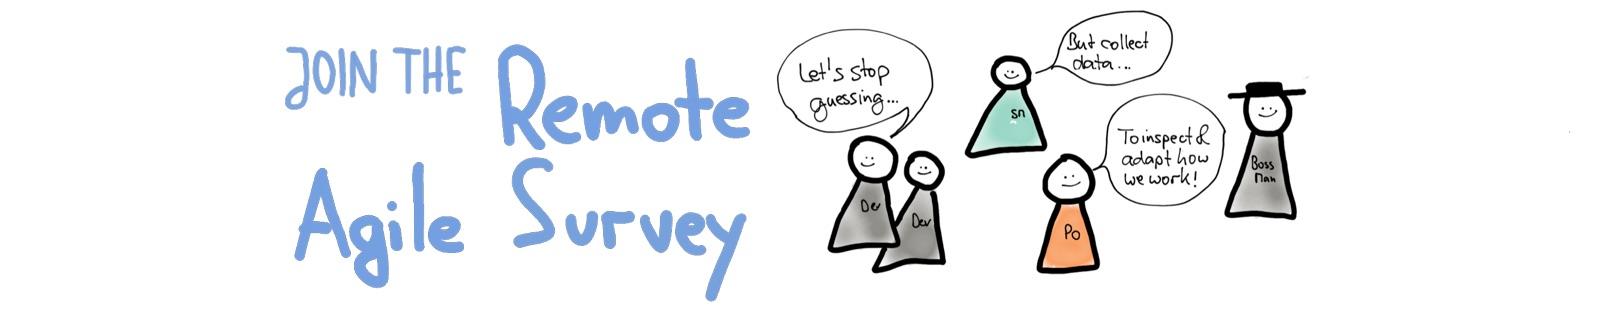 Remote Agile Survey 2020